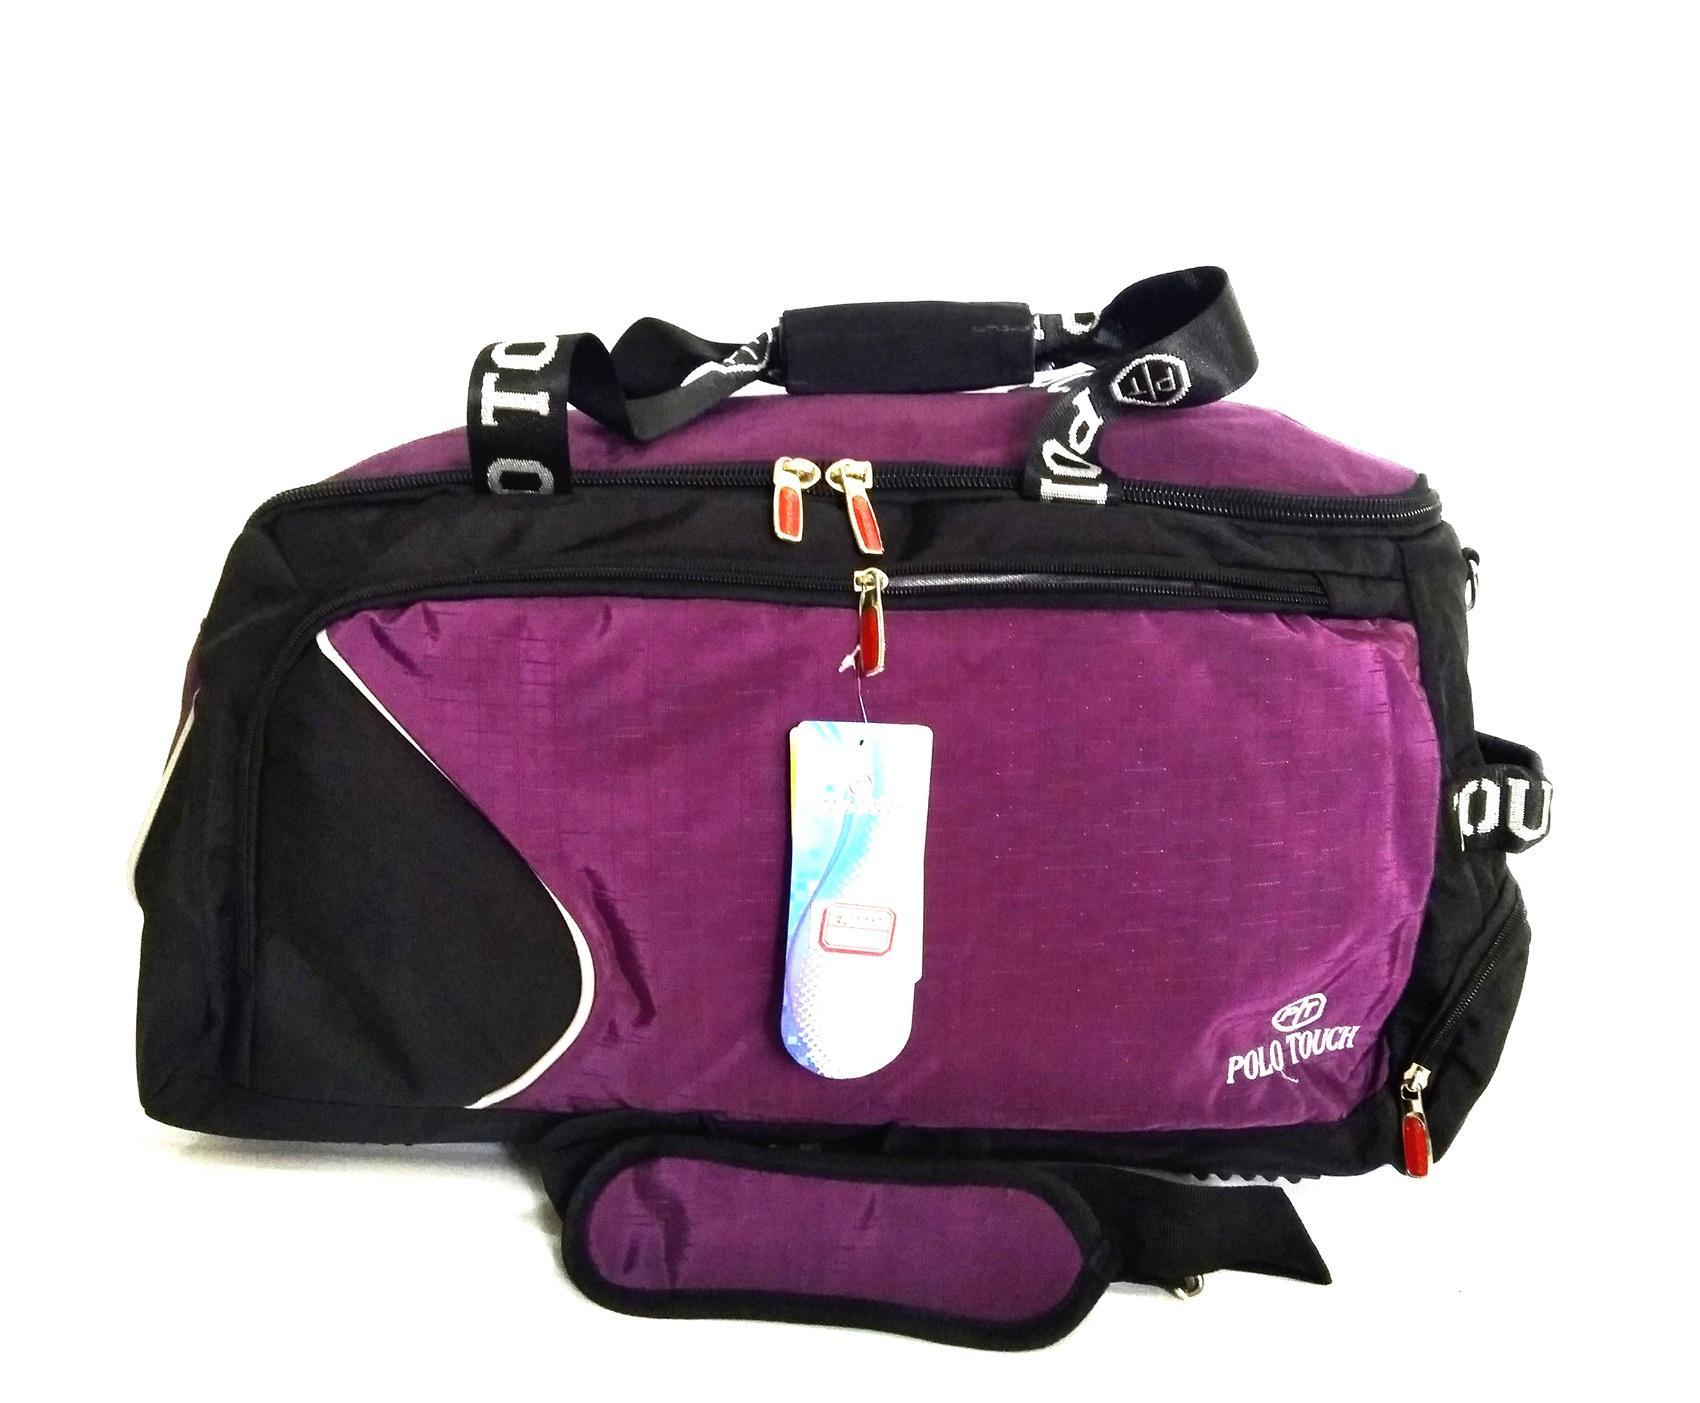 Tas Olahraga Futsal Gym Travel Bag Jumbo Polo Touch Ada Slot Sepatu By Tendakaki5.